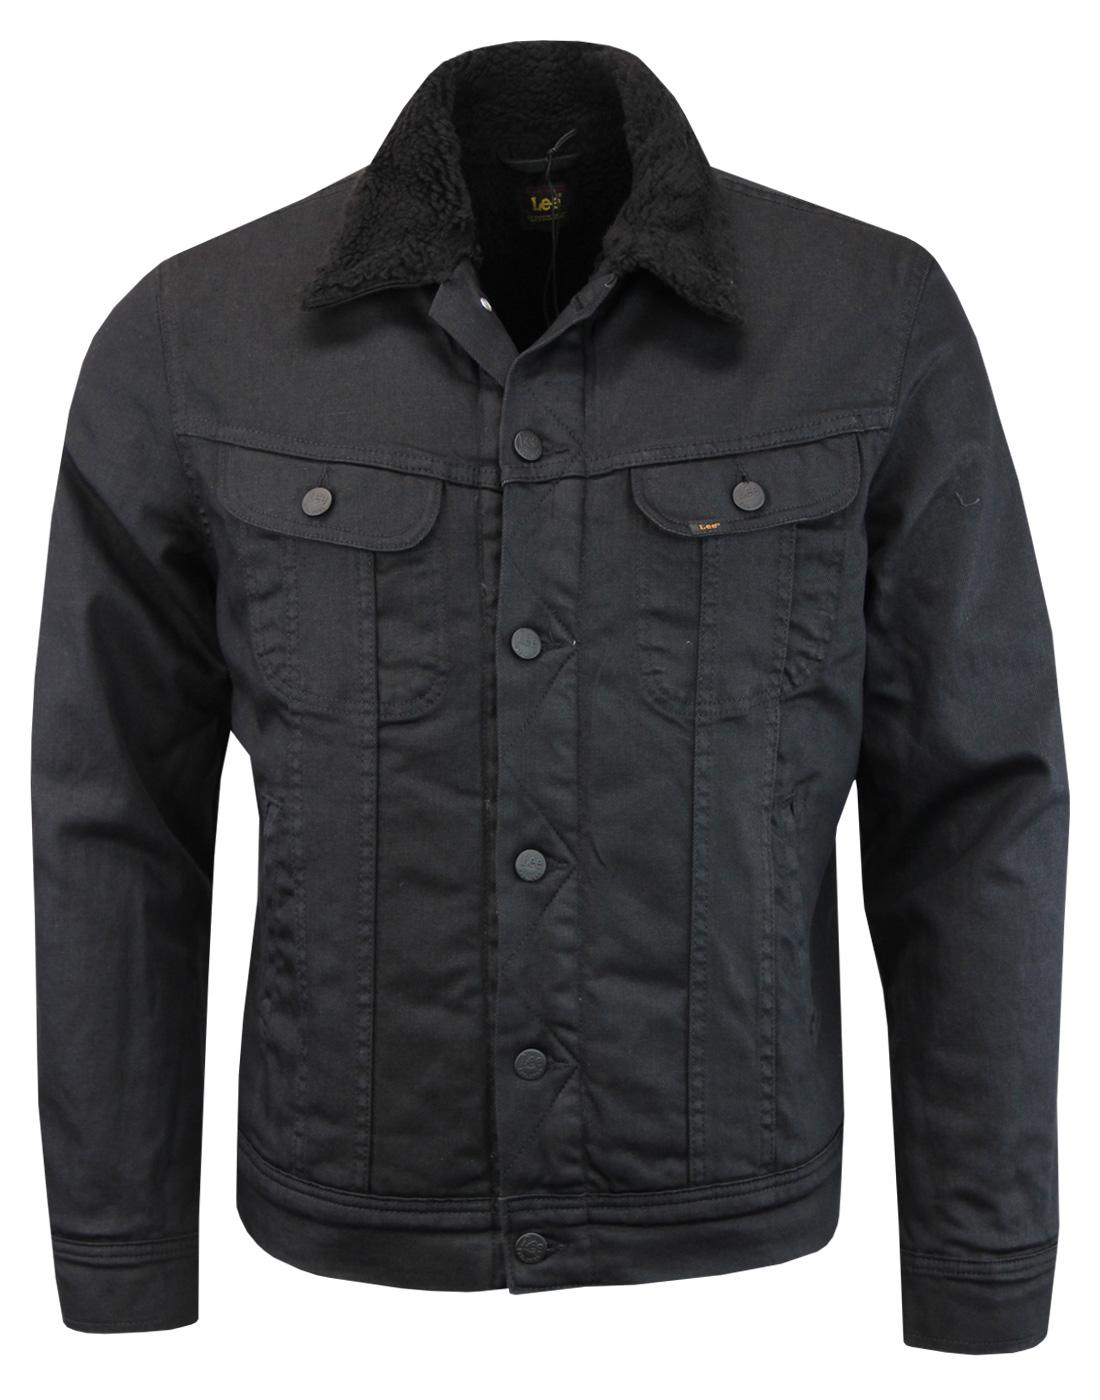 LEE Retro Coated Denim Sherpa Rider Jacket (BG)